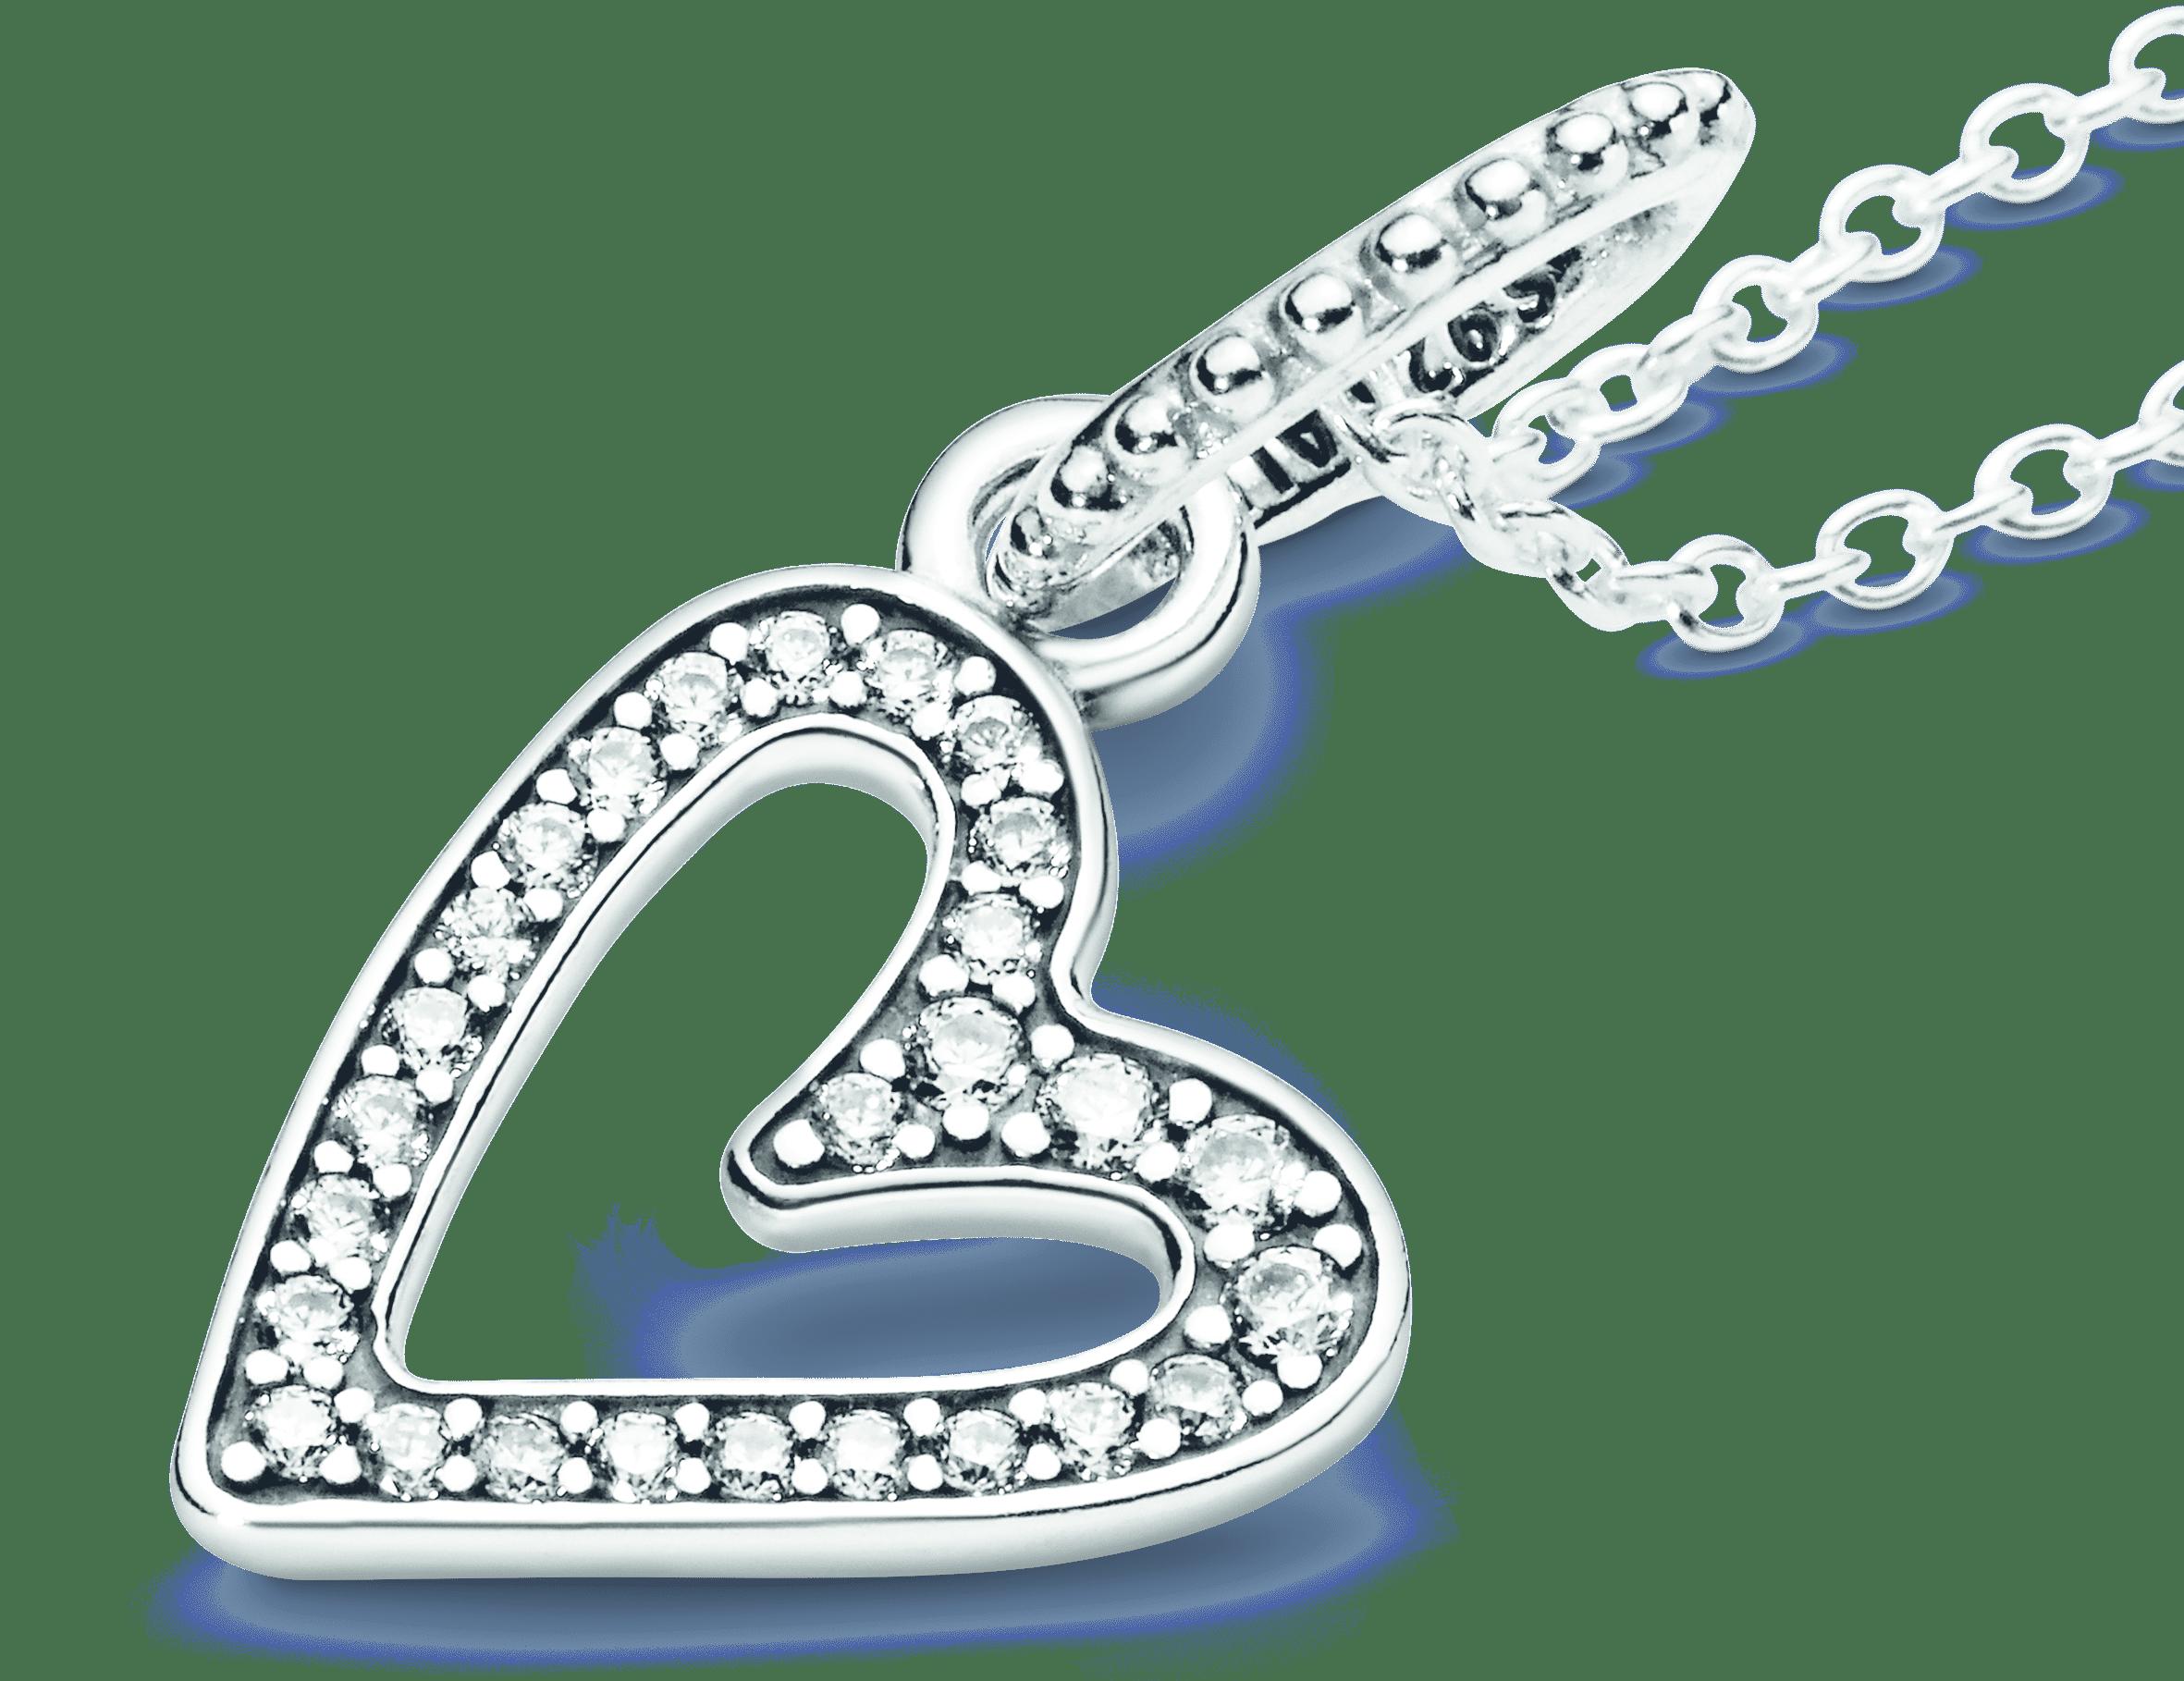 pandora, galentines, jewelry, mona butler, helen siwak, vancouver, vancity, yvr, bc, ecoluxluv, folioyvr